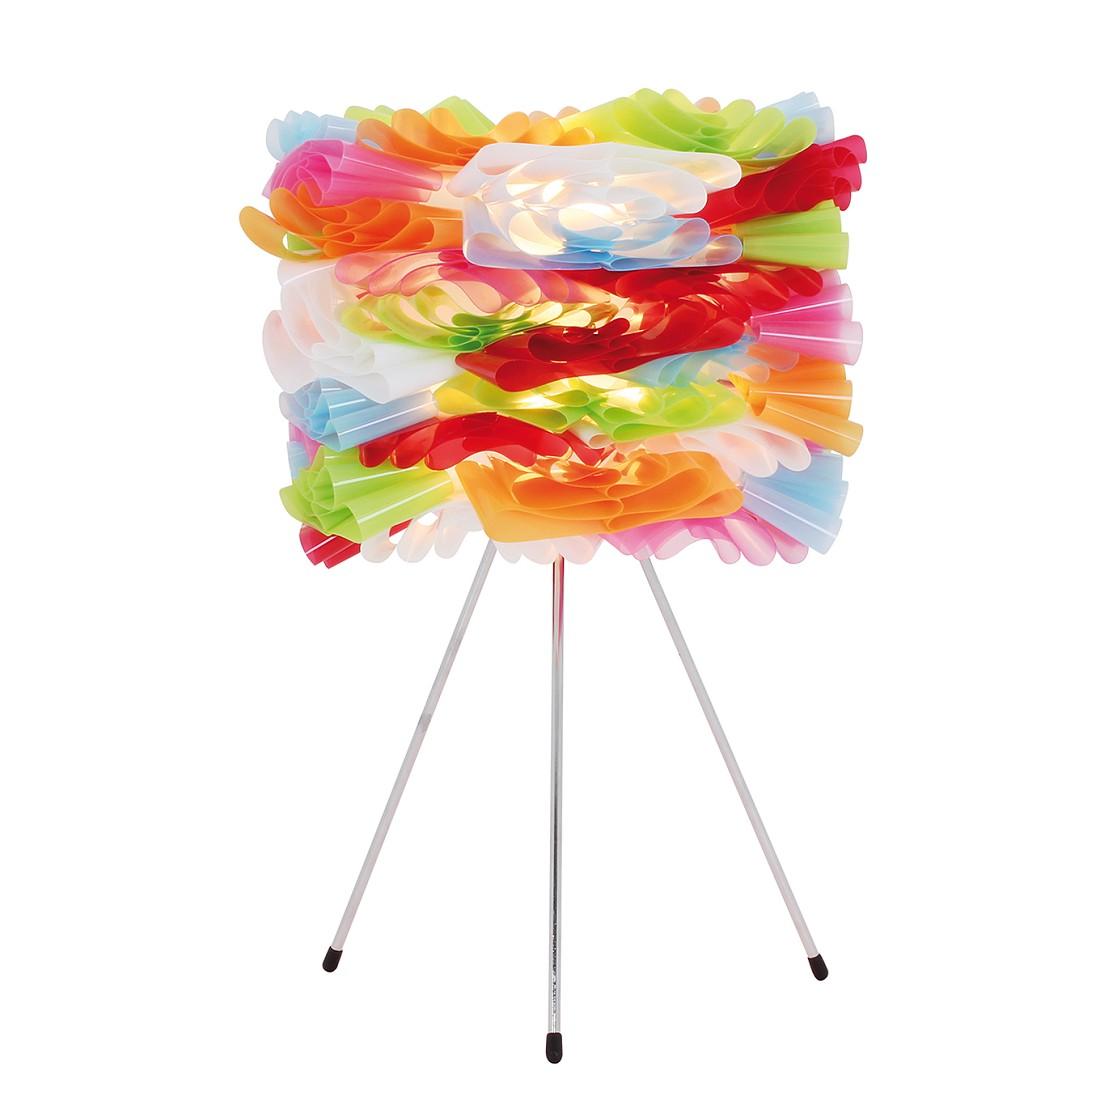 Tischleuchte Marty ● Kunststoff/ Metall ● Multicolor ● 1-flammig- Näve